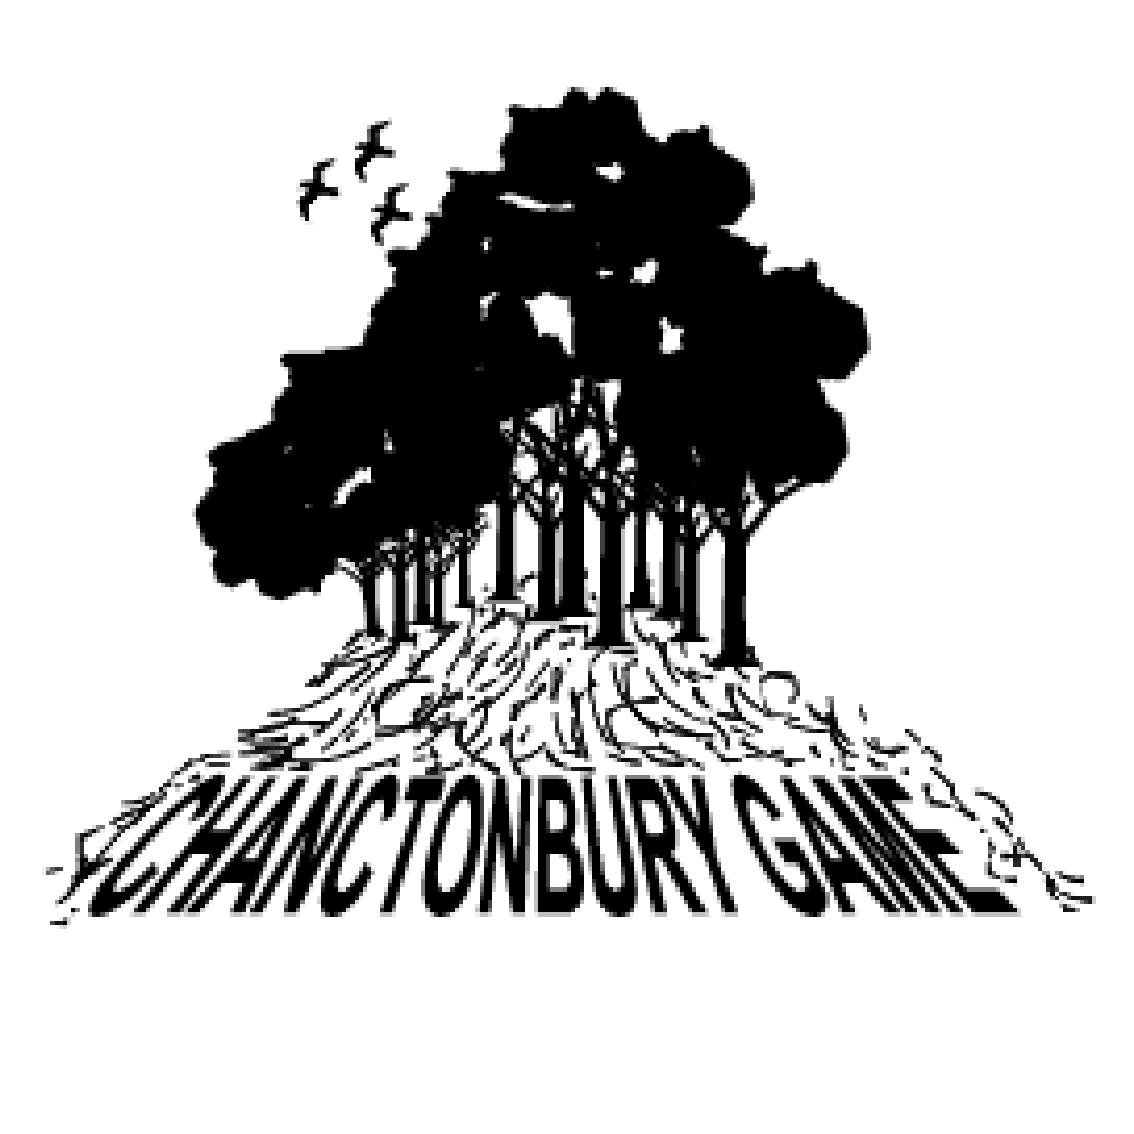 Chanctonbury Game